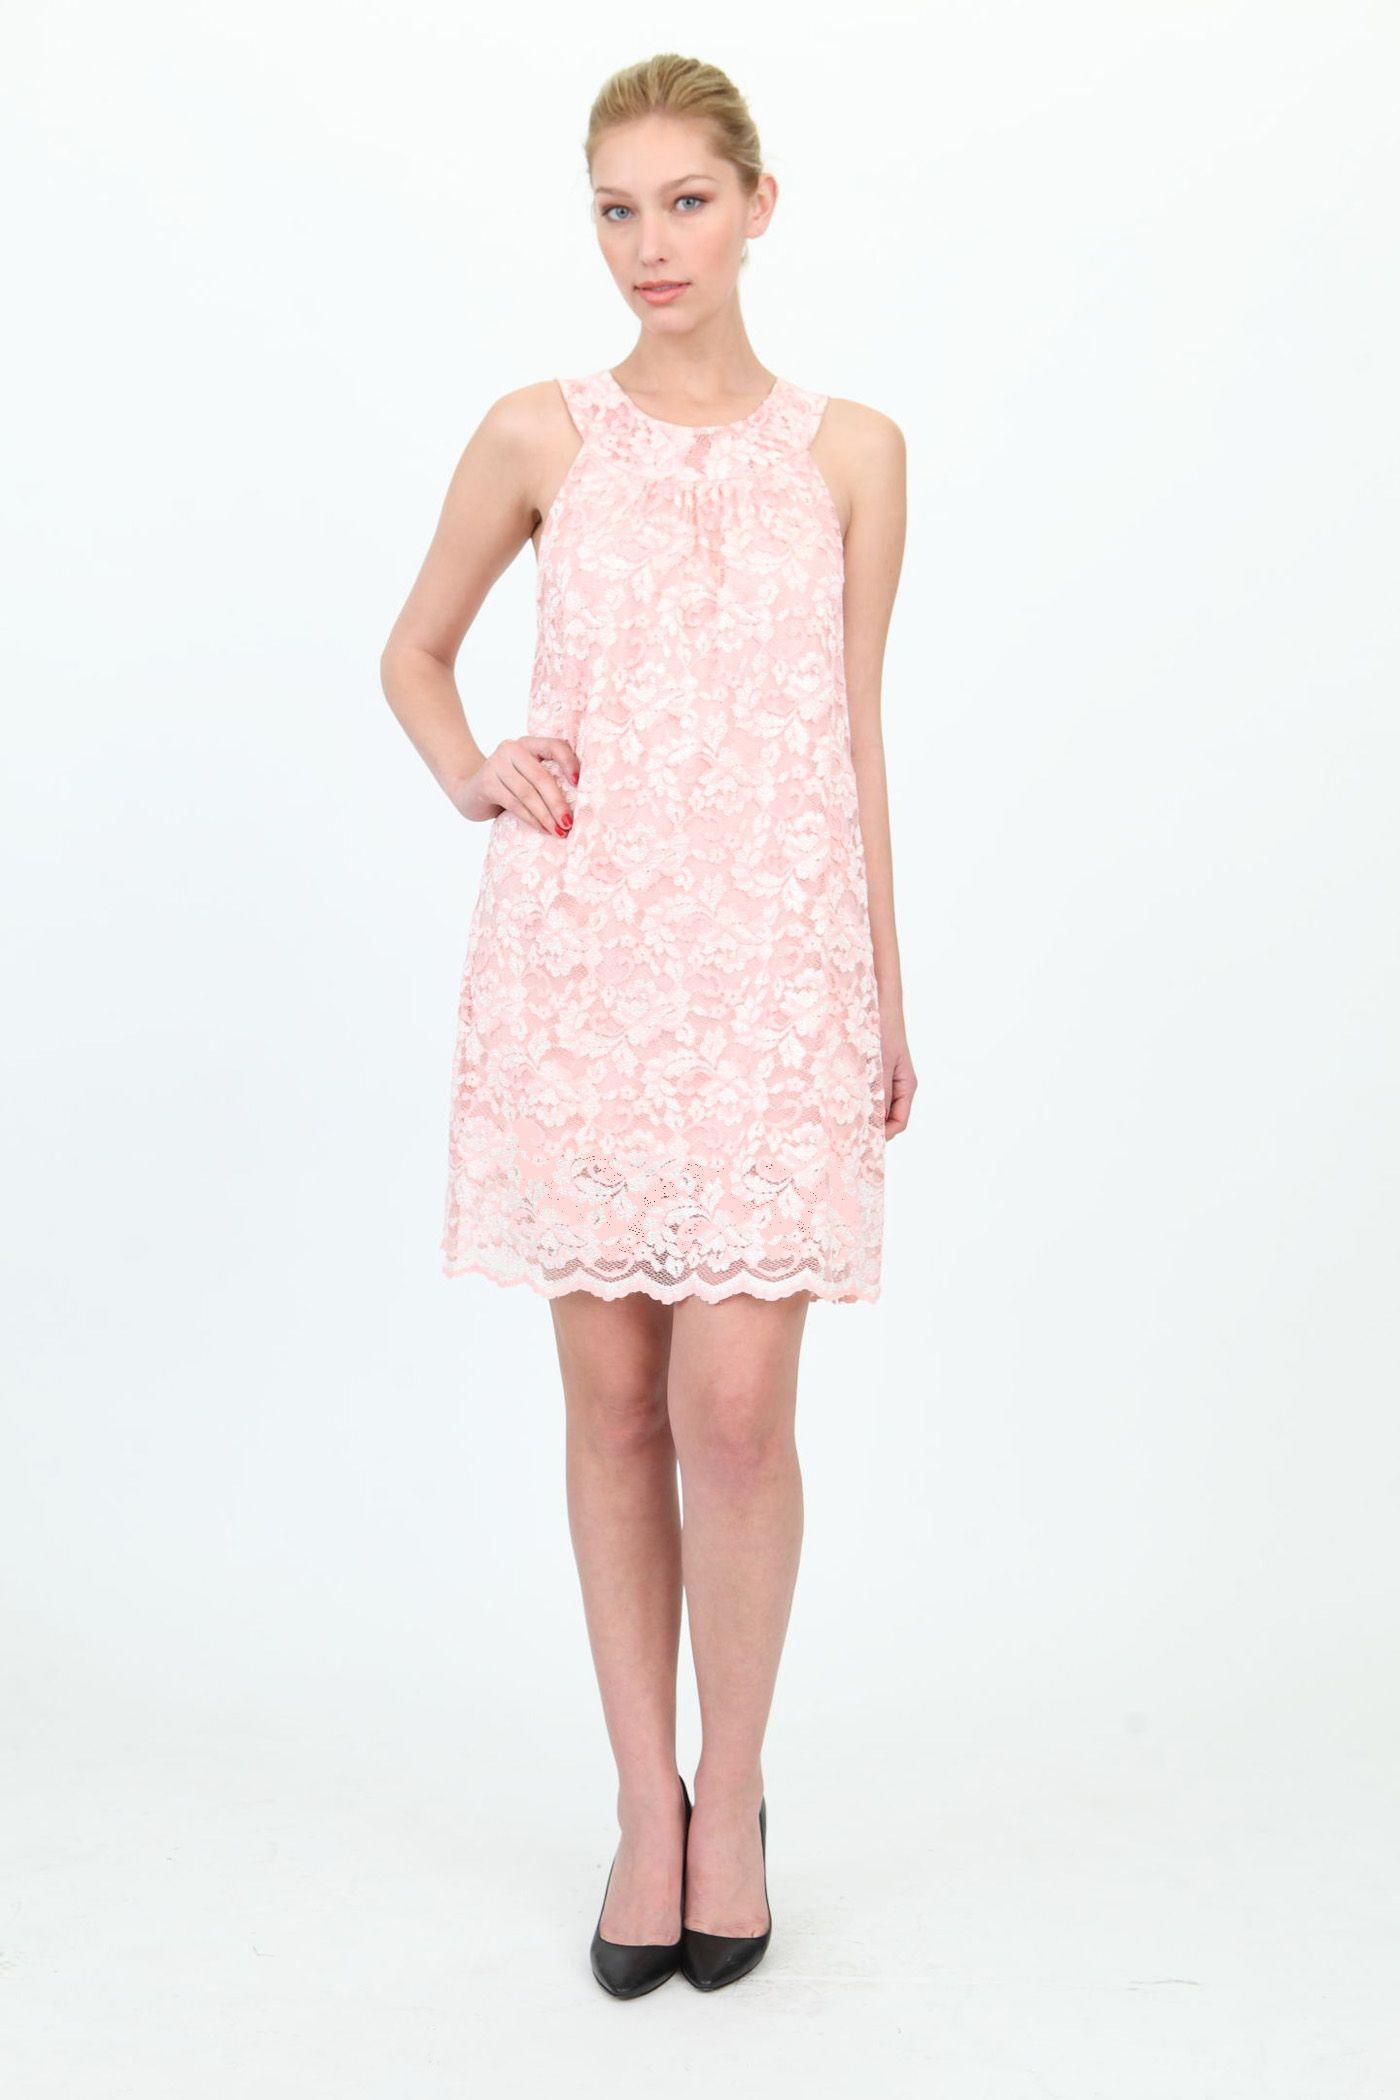 Daisy Dress   SS 2014-©2014 -Berqclé LLC #babydoll #dress #lace #floral #fun #flirty #spring #summer